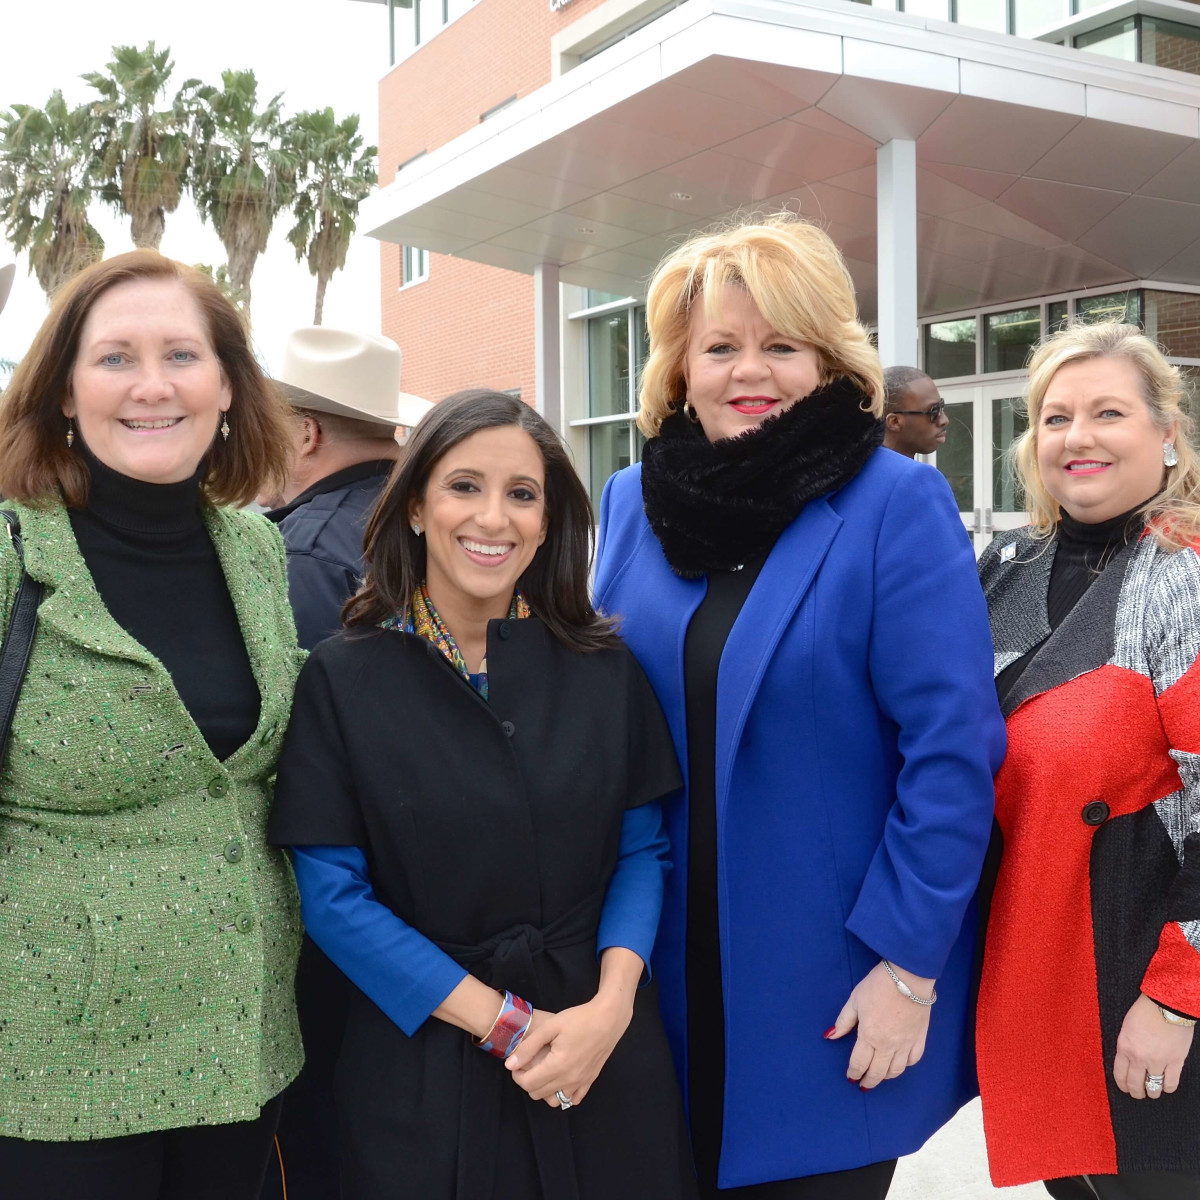 Diane Englet, Rania Mankarious, Brenda Stardig, Katrina Arnim at Crime Stoppers building dedication